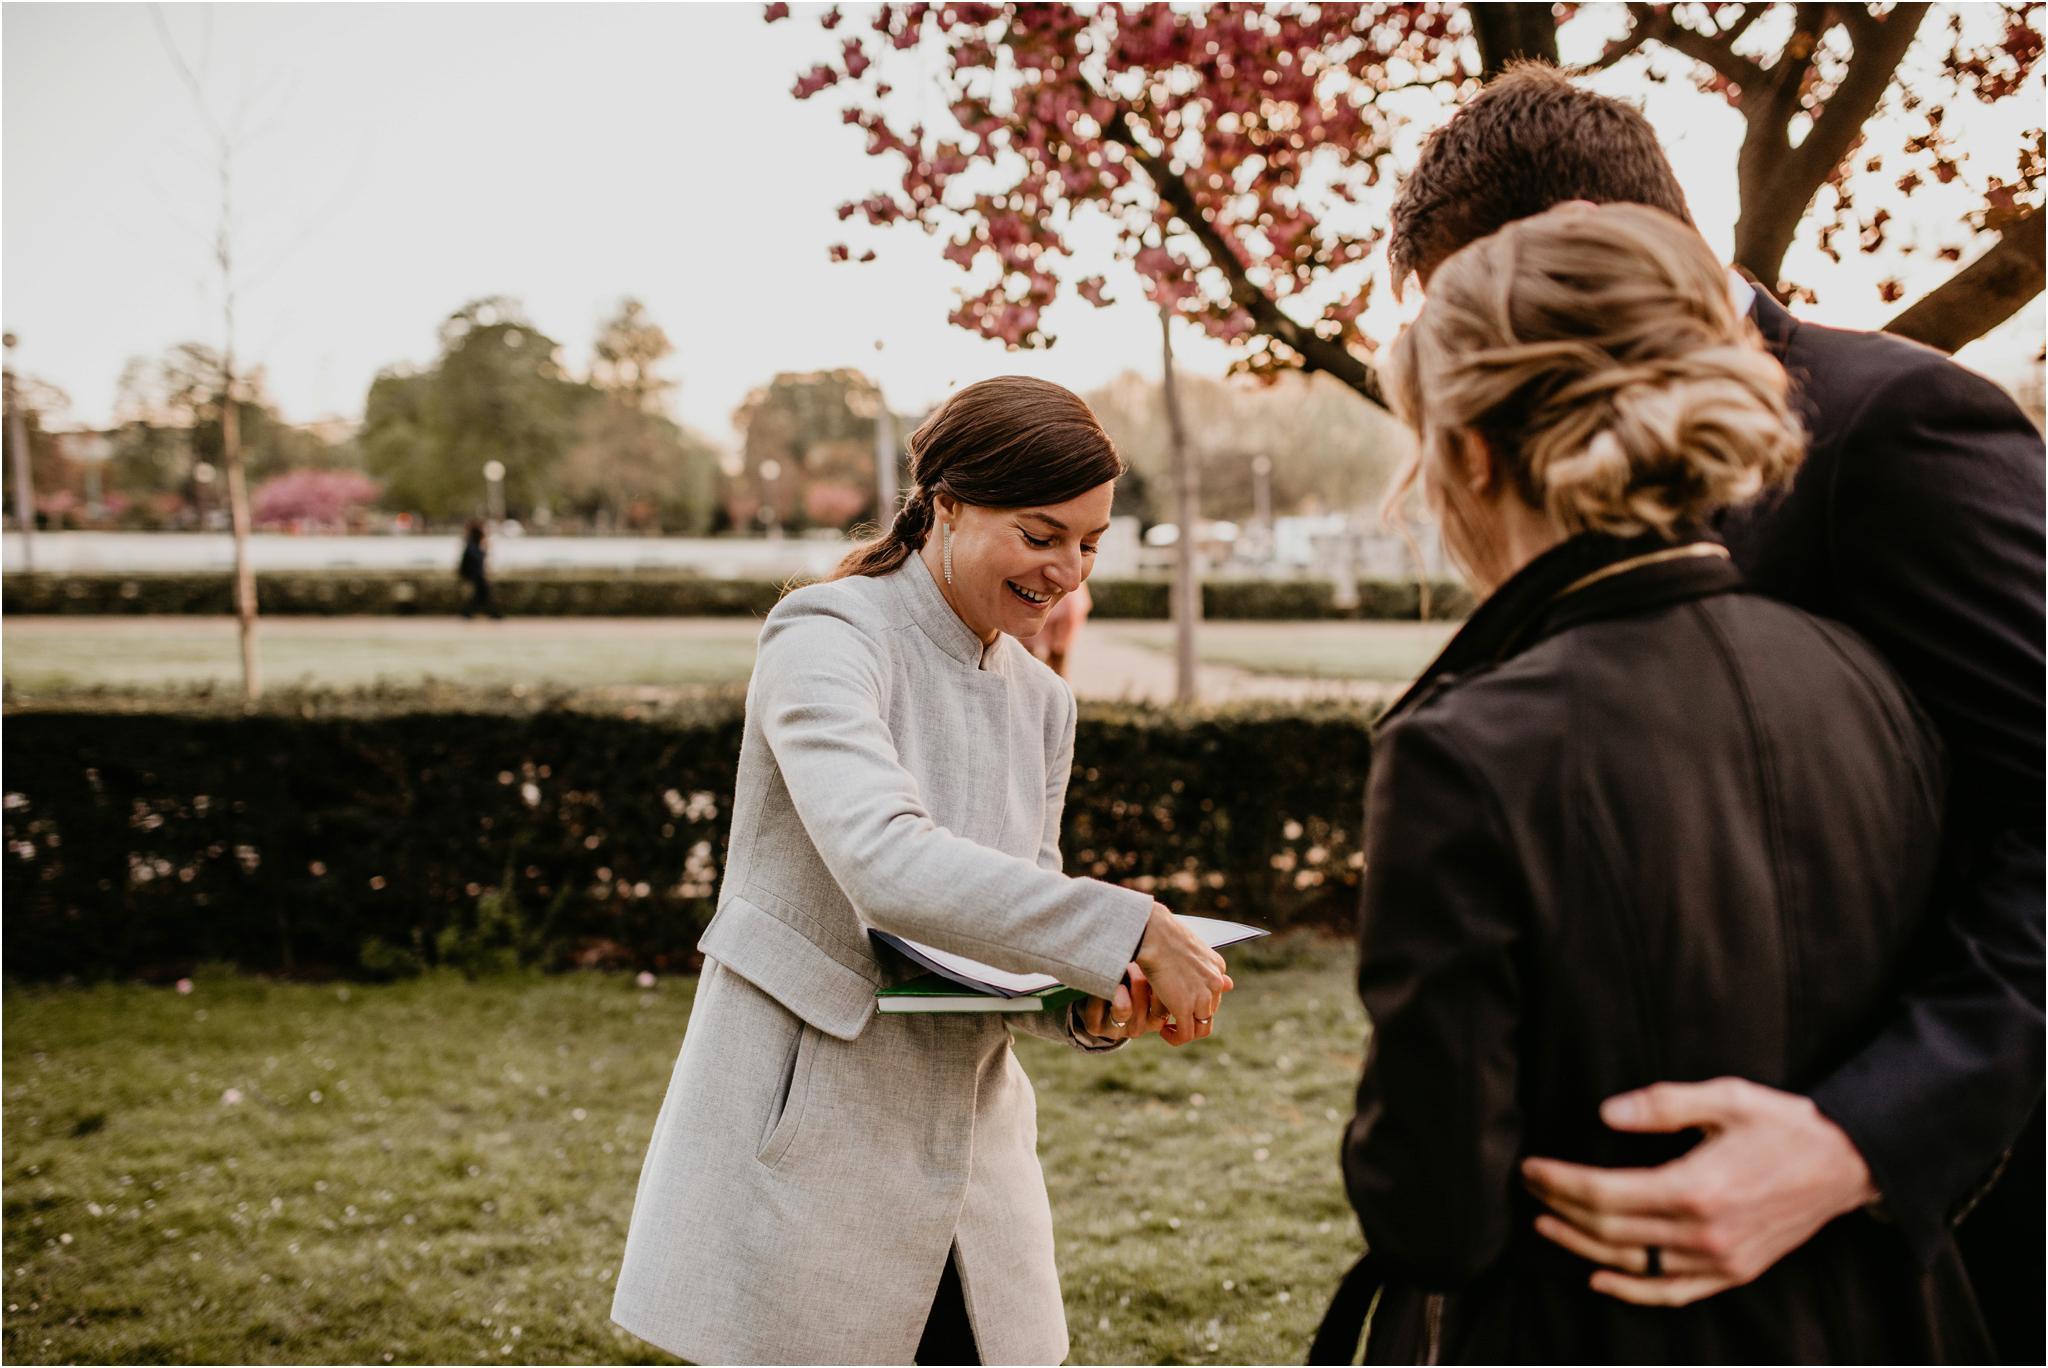 miranda-and-jared-paris-elopement-destination-wedding-photographer-042.jpg